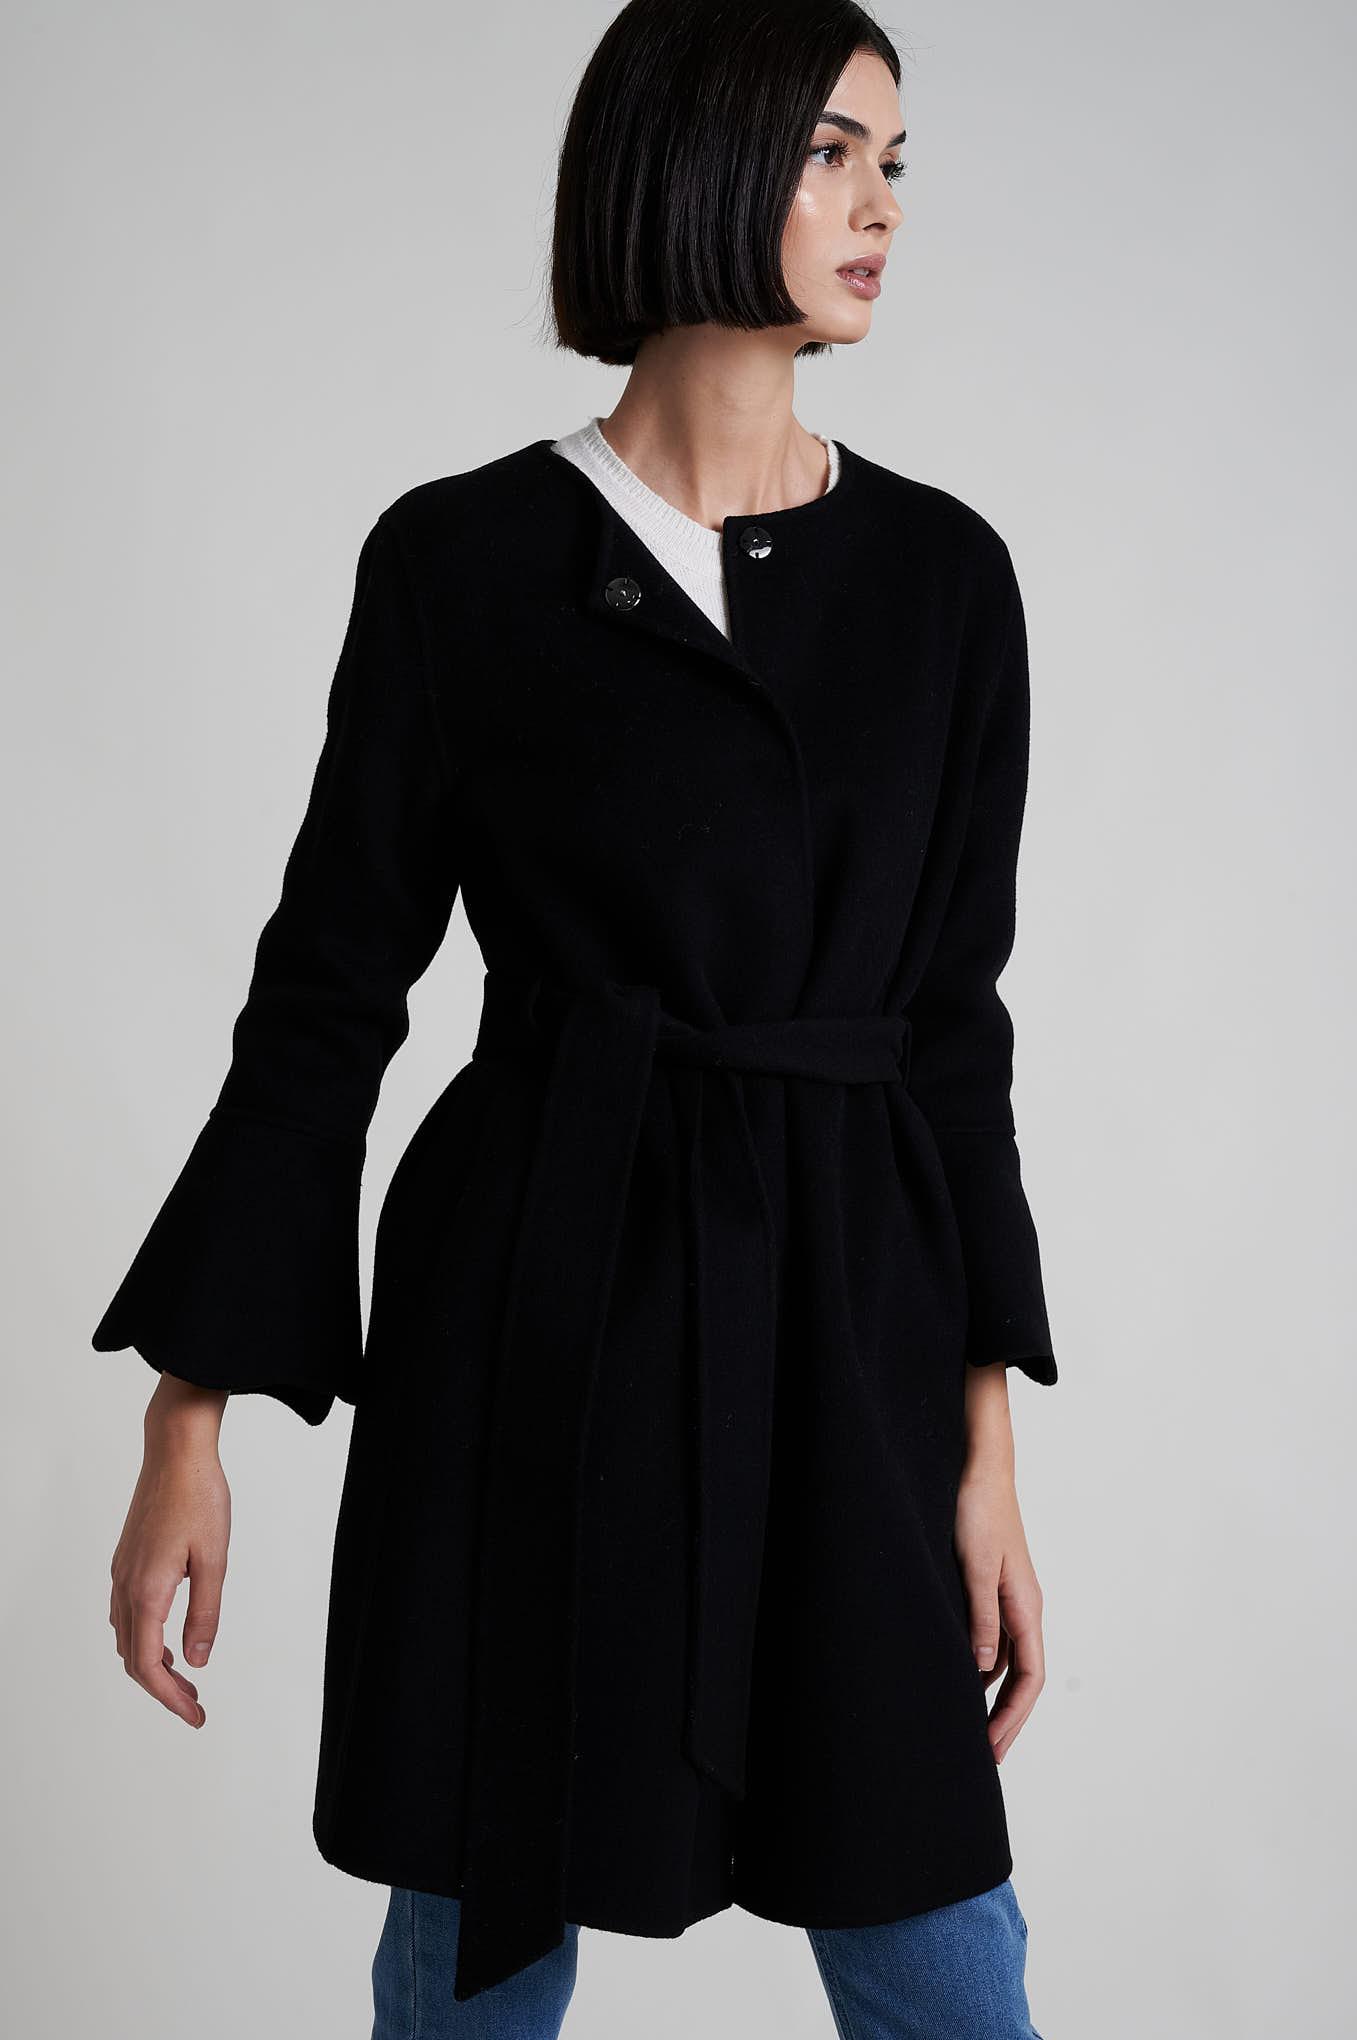 Coat Black Casual Woman